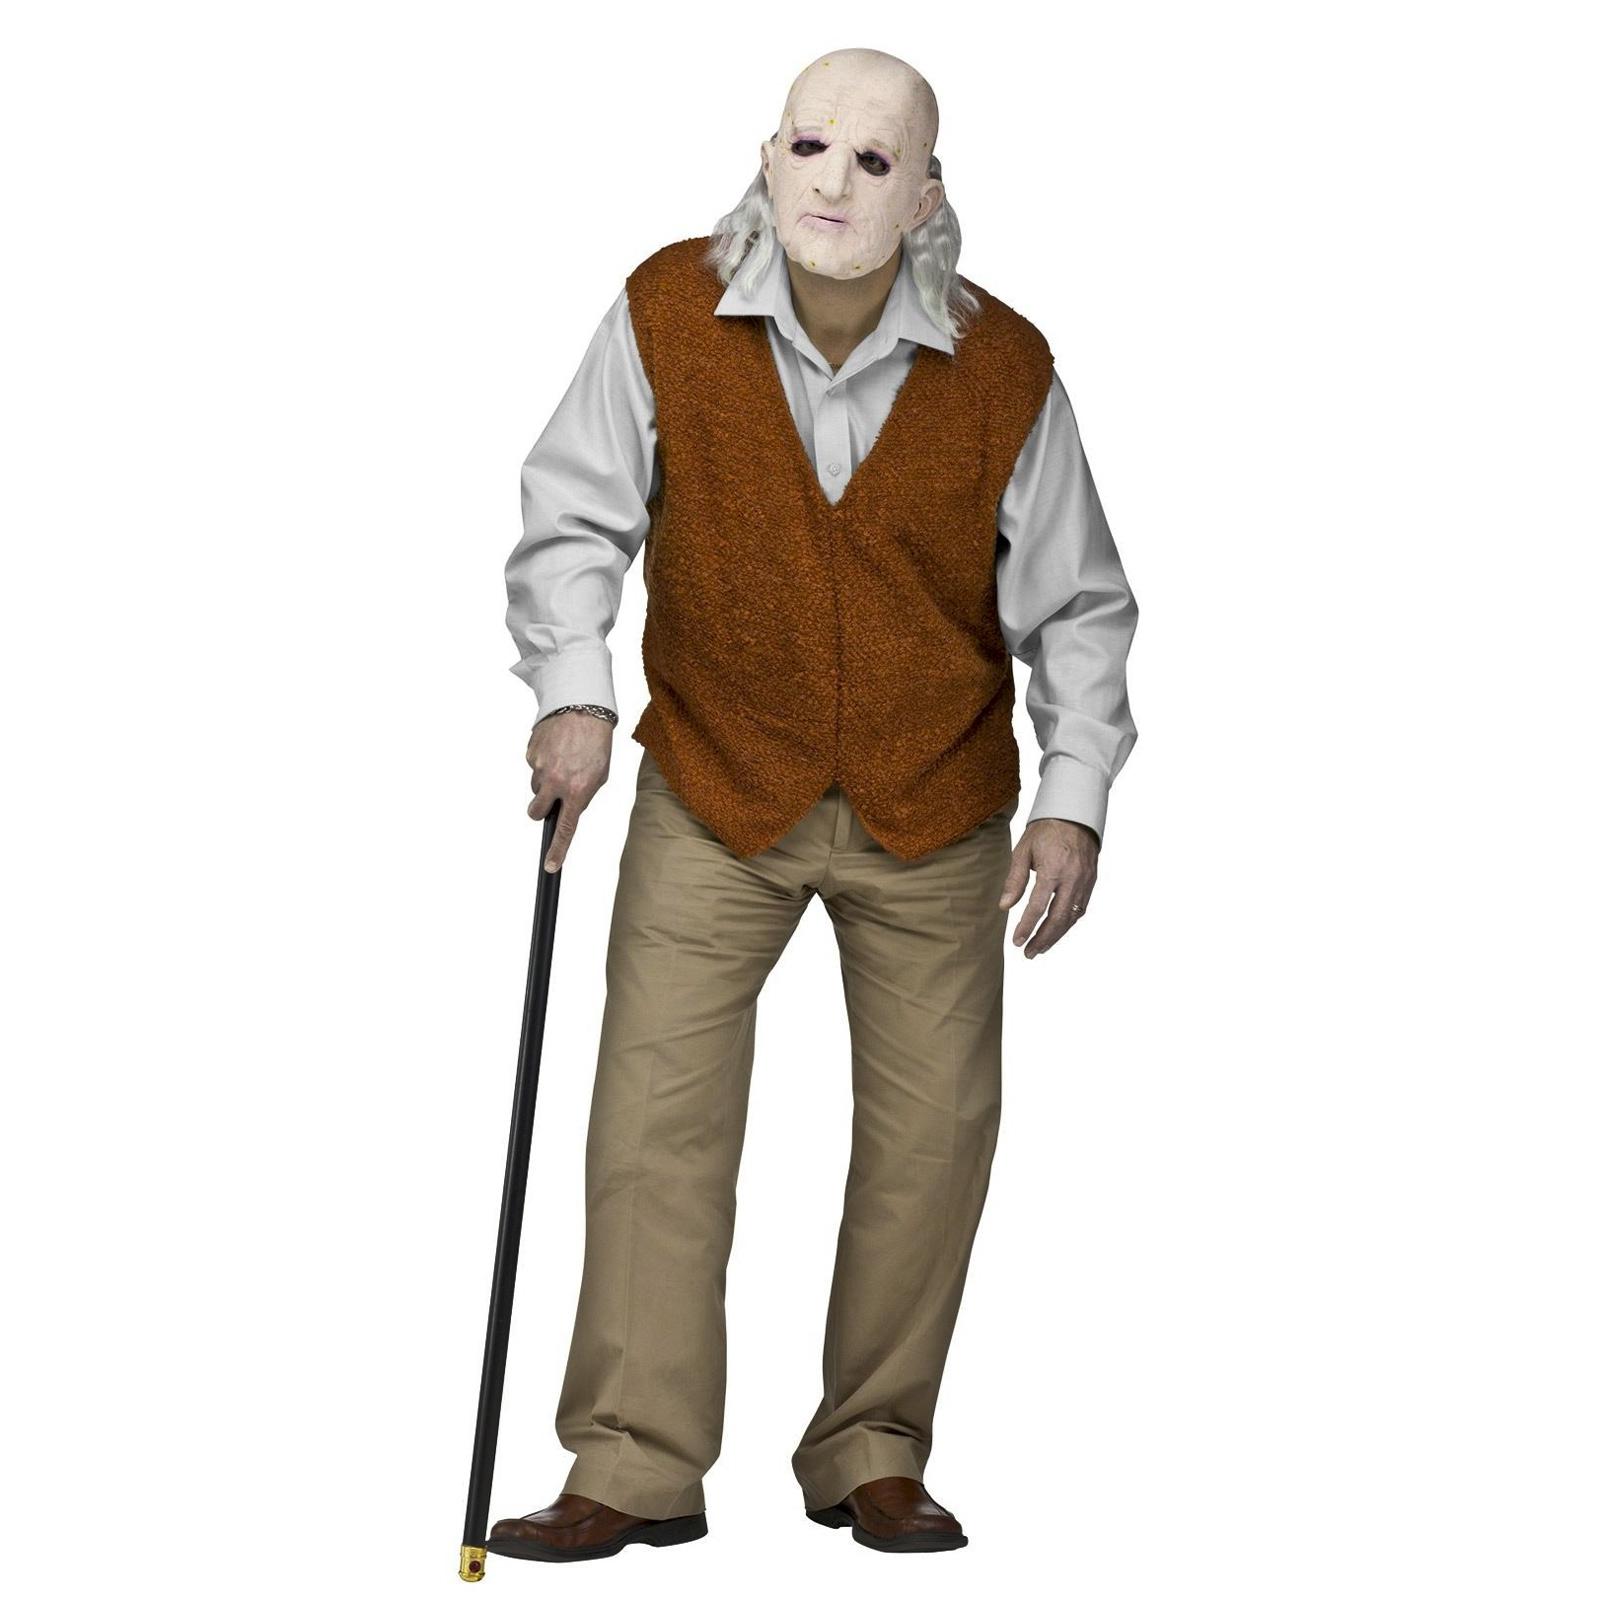 Grandpa Costume | www.pixshark.com - Images Galleries With A Bite!